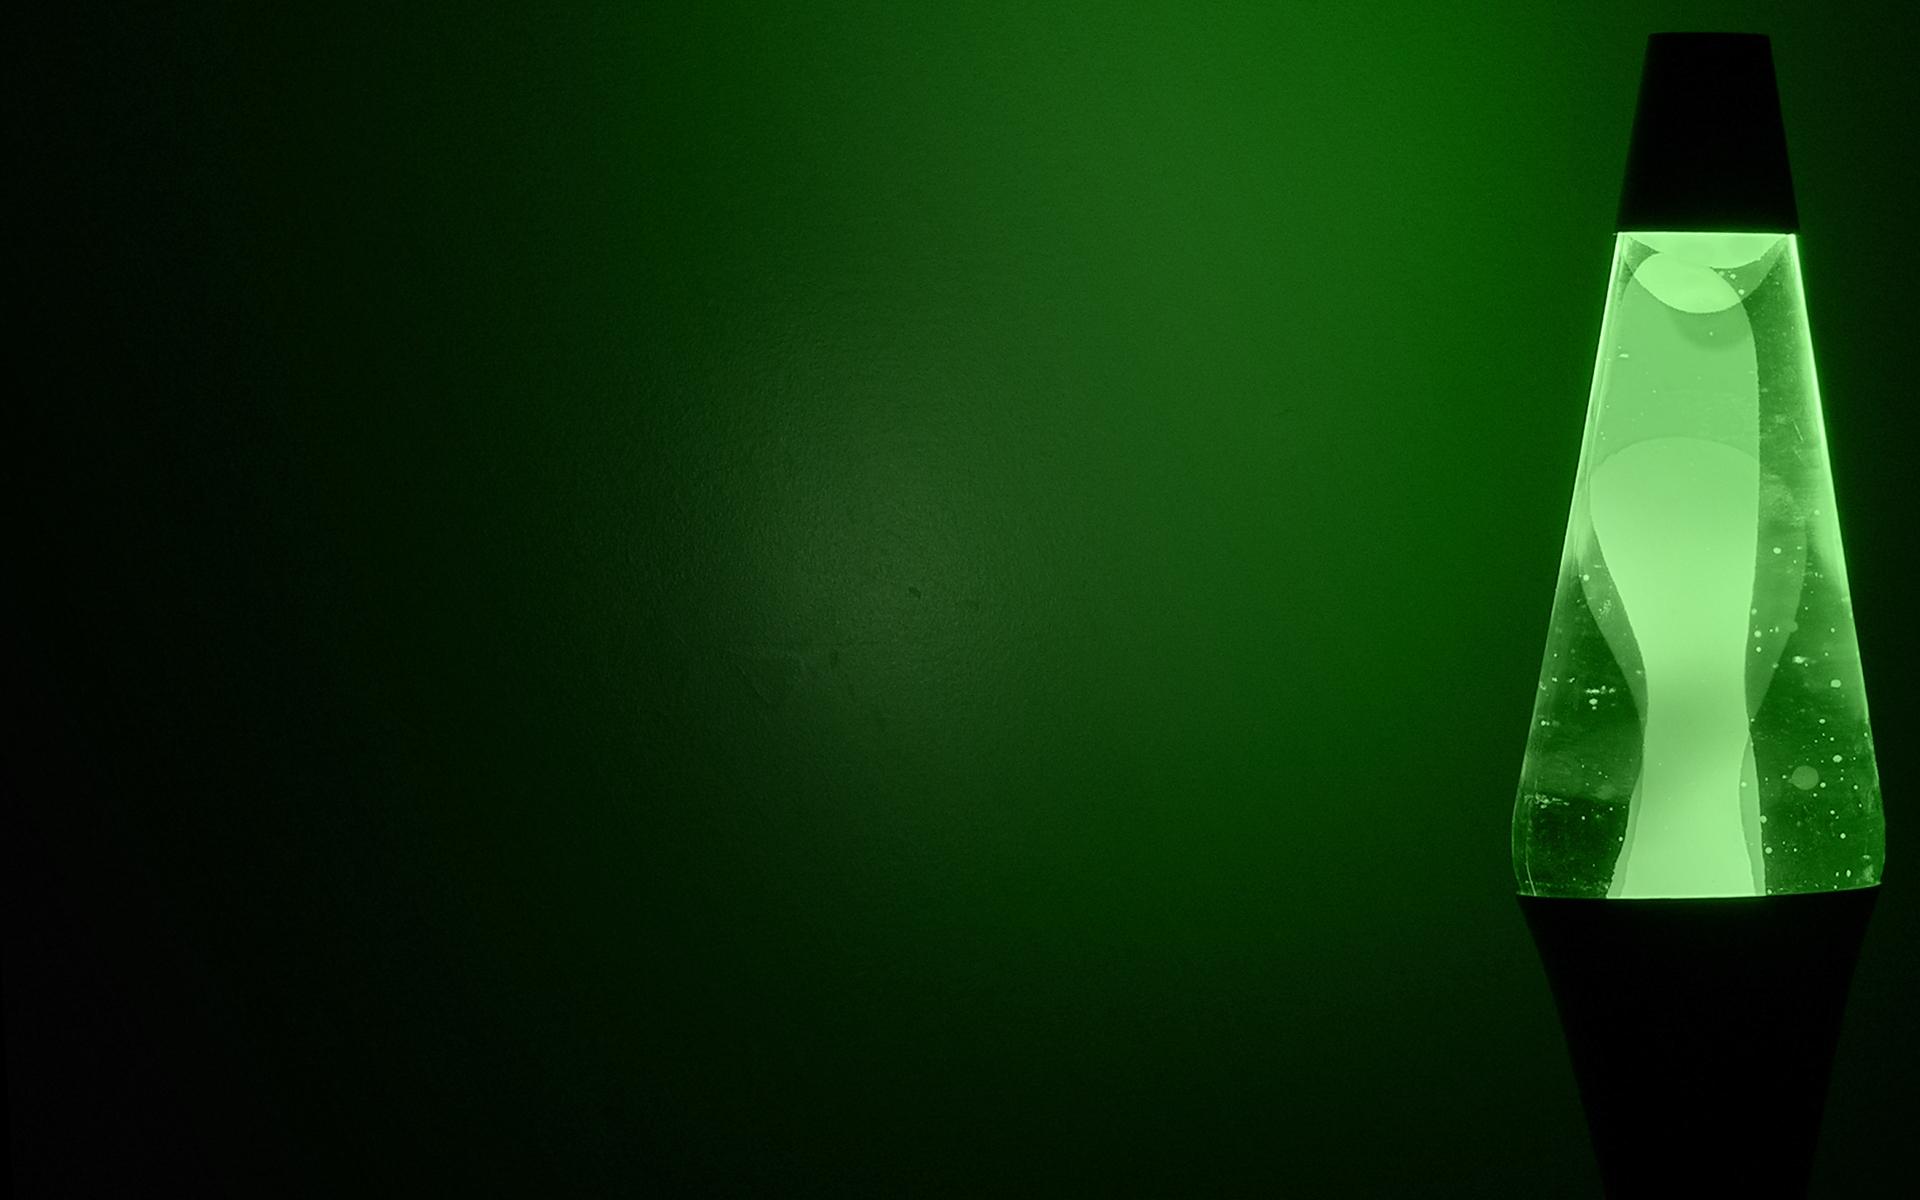 Green Lava Lamp wallpapers Green Lava Lamp stock photos 1920x1200